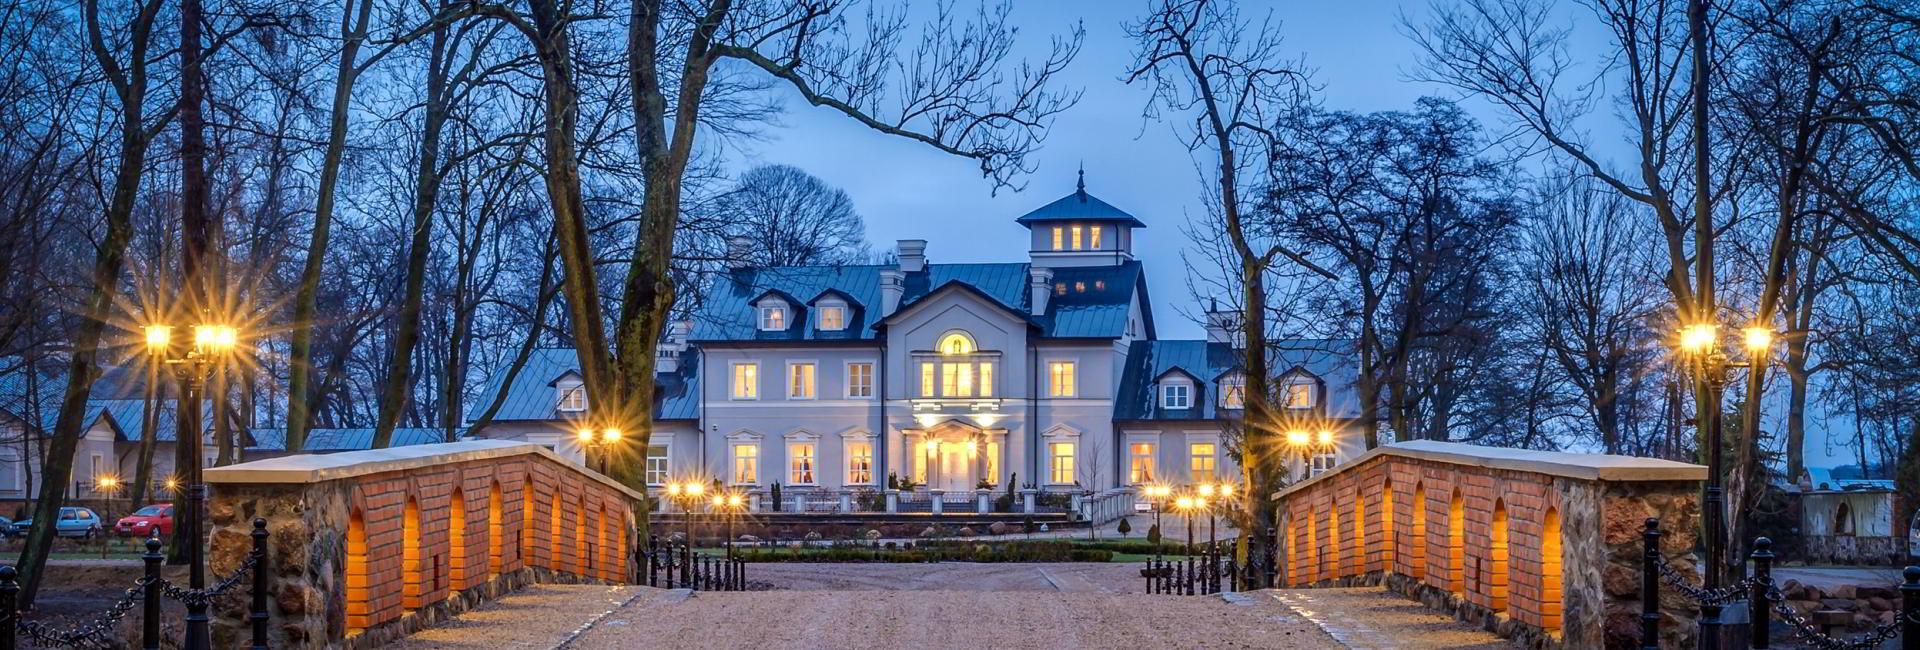 Talaria Resort & Spa, Mazowieckie, Poland